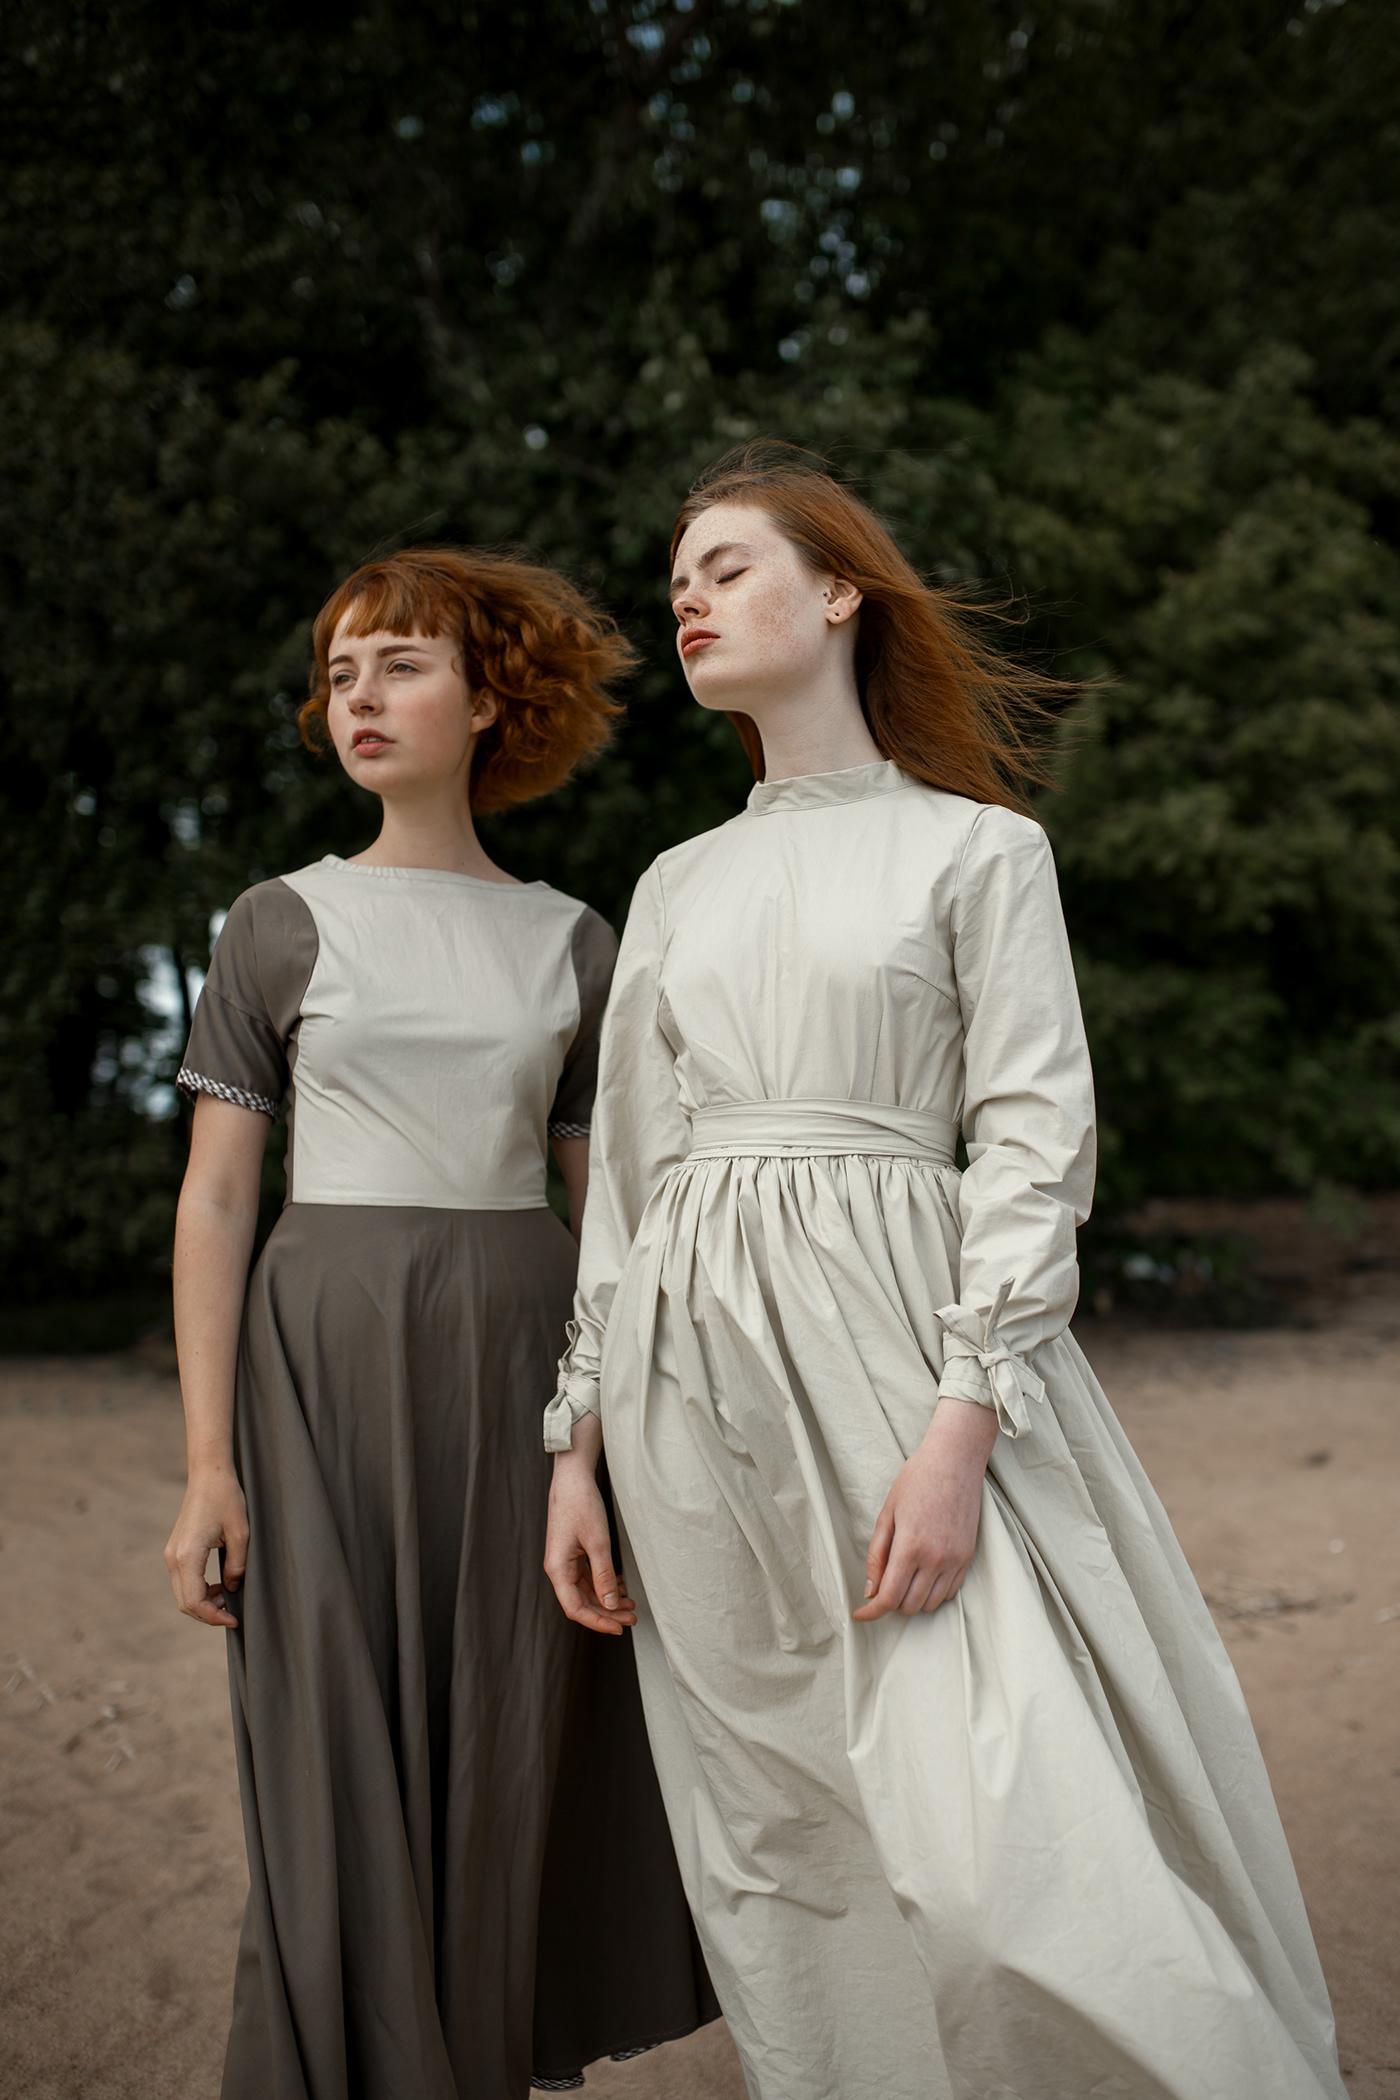 35mm art clothes Fashion  Lookbook people portrait sony alpha